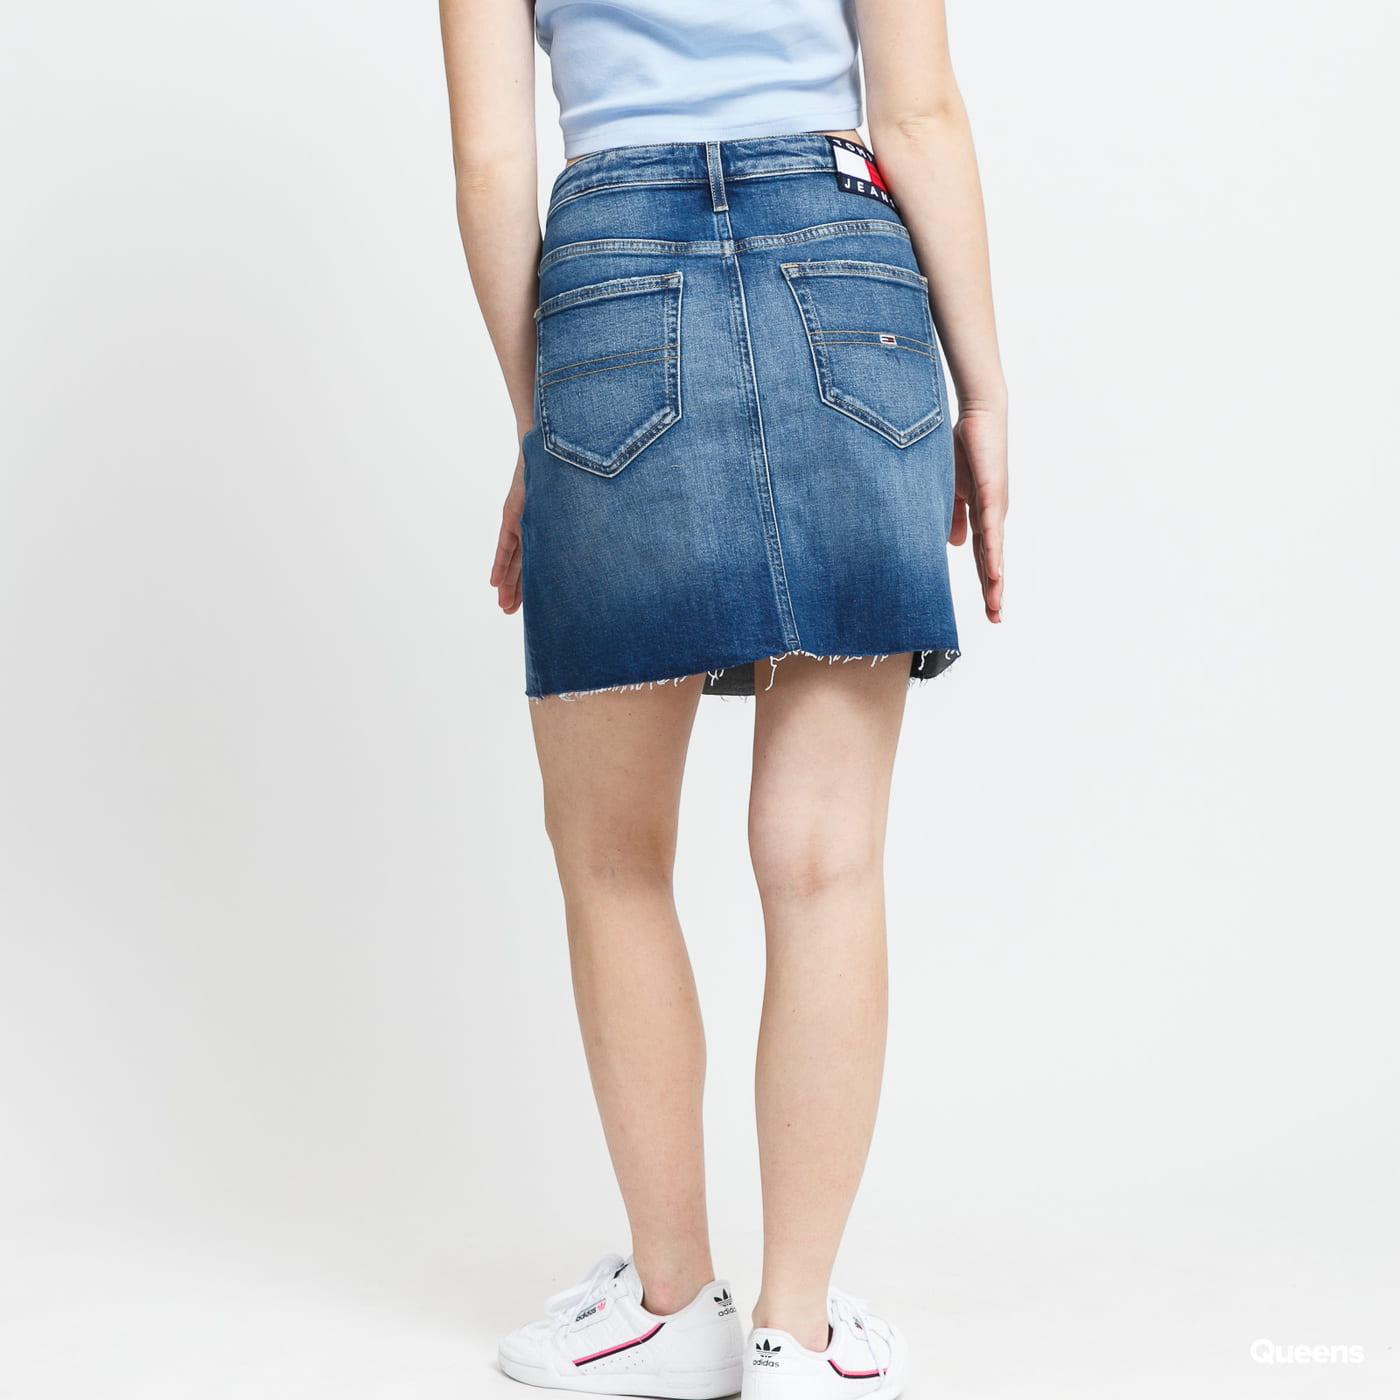 TOMMY JEANS W Short Denim Skirt ames mb com